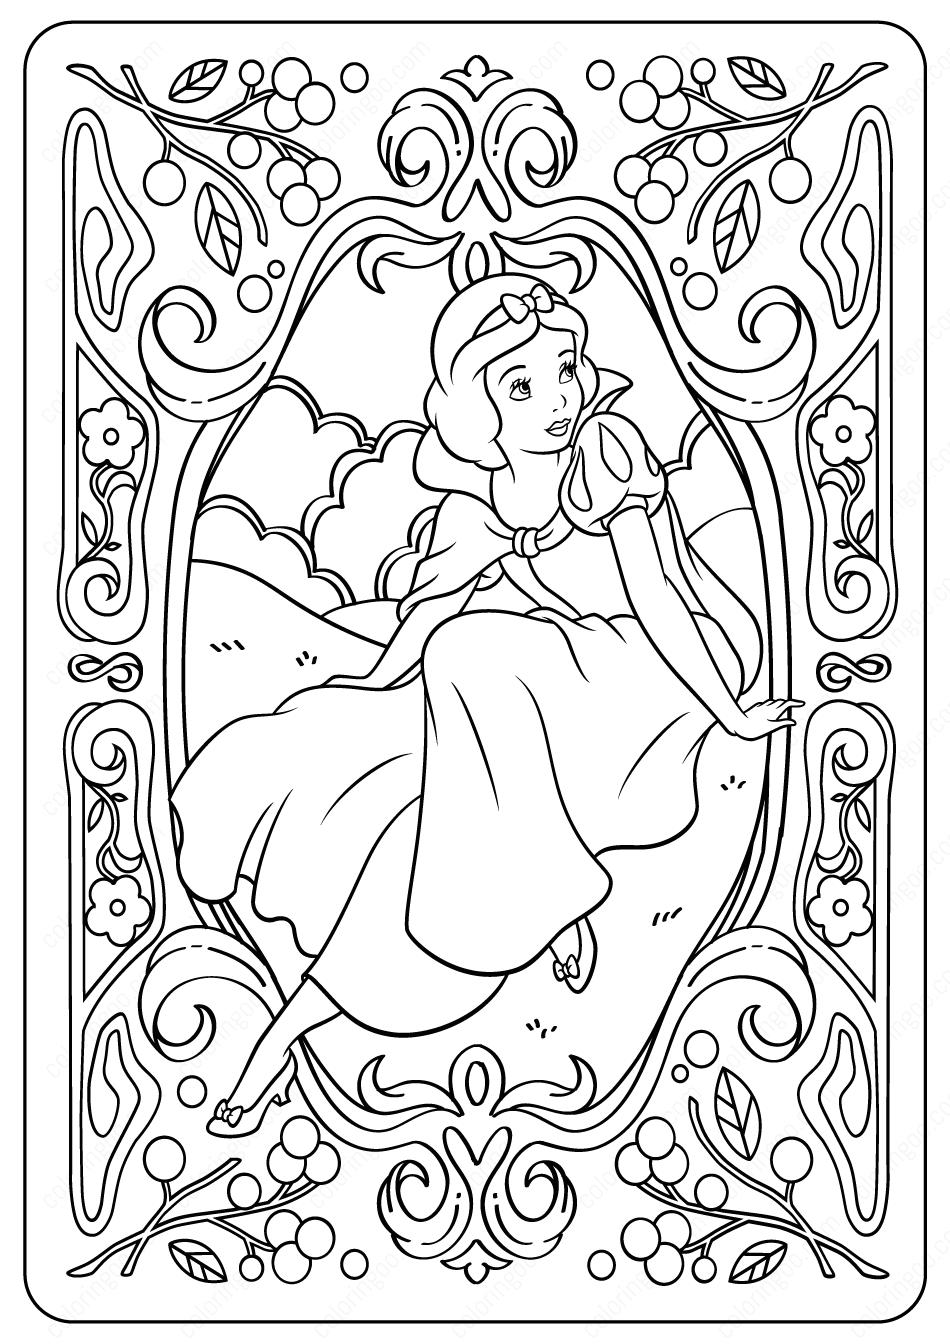 Coloring Pages Disney Pdf